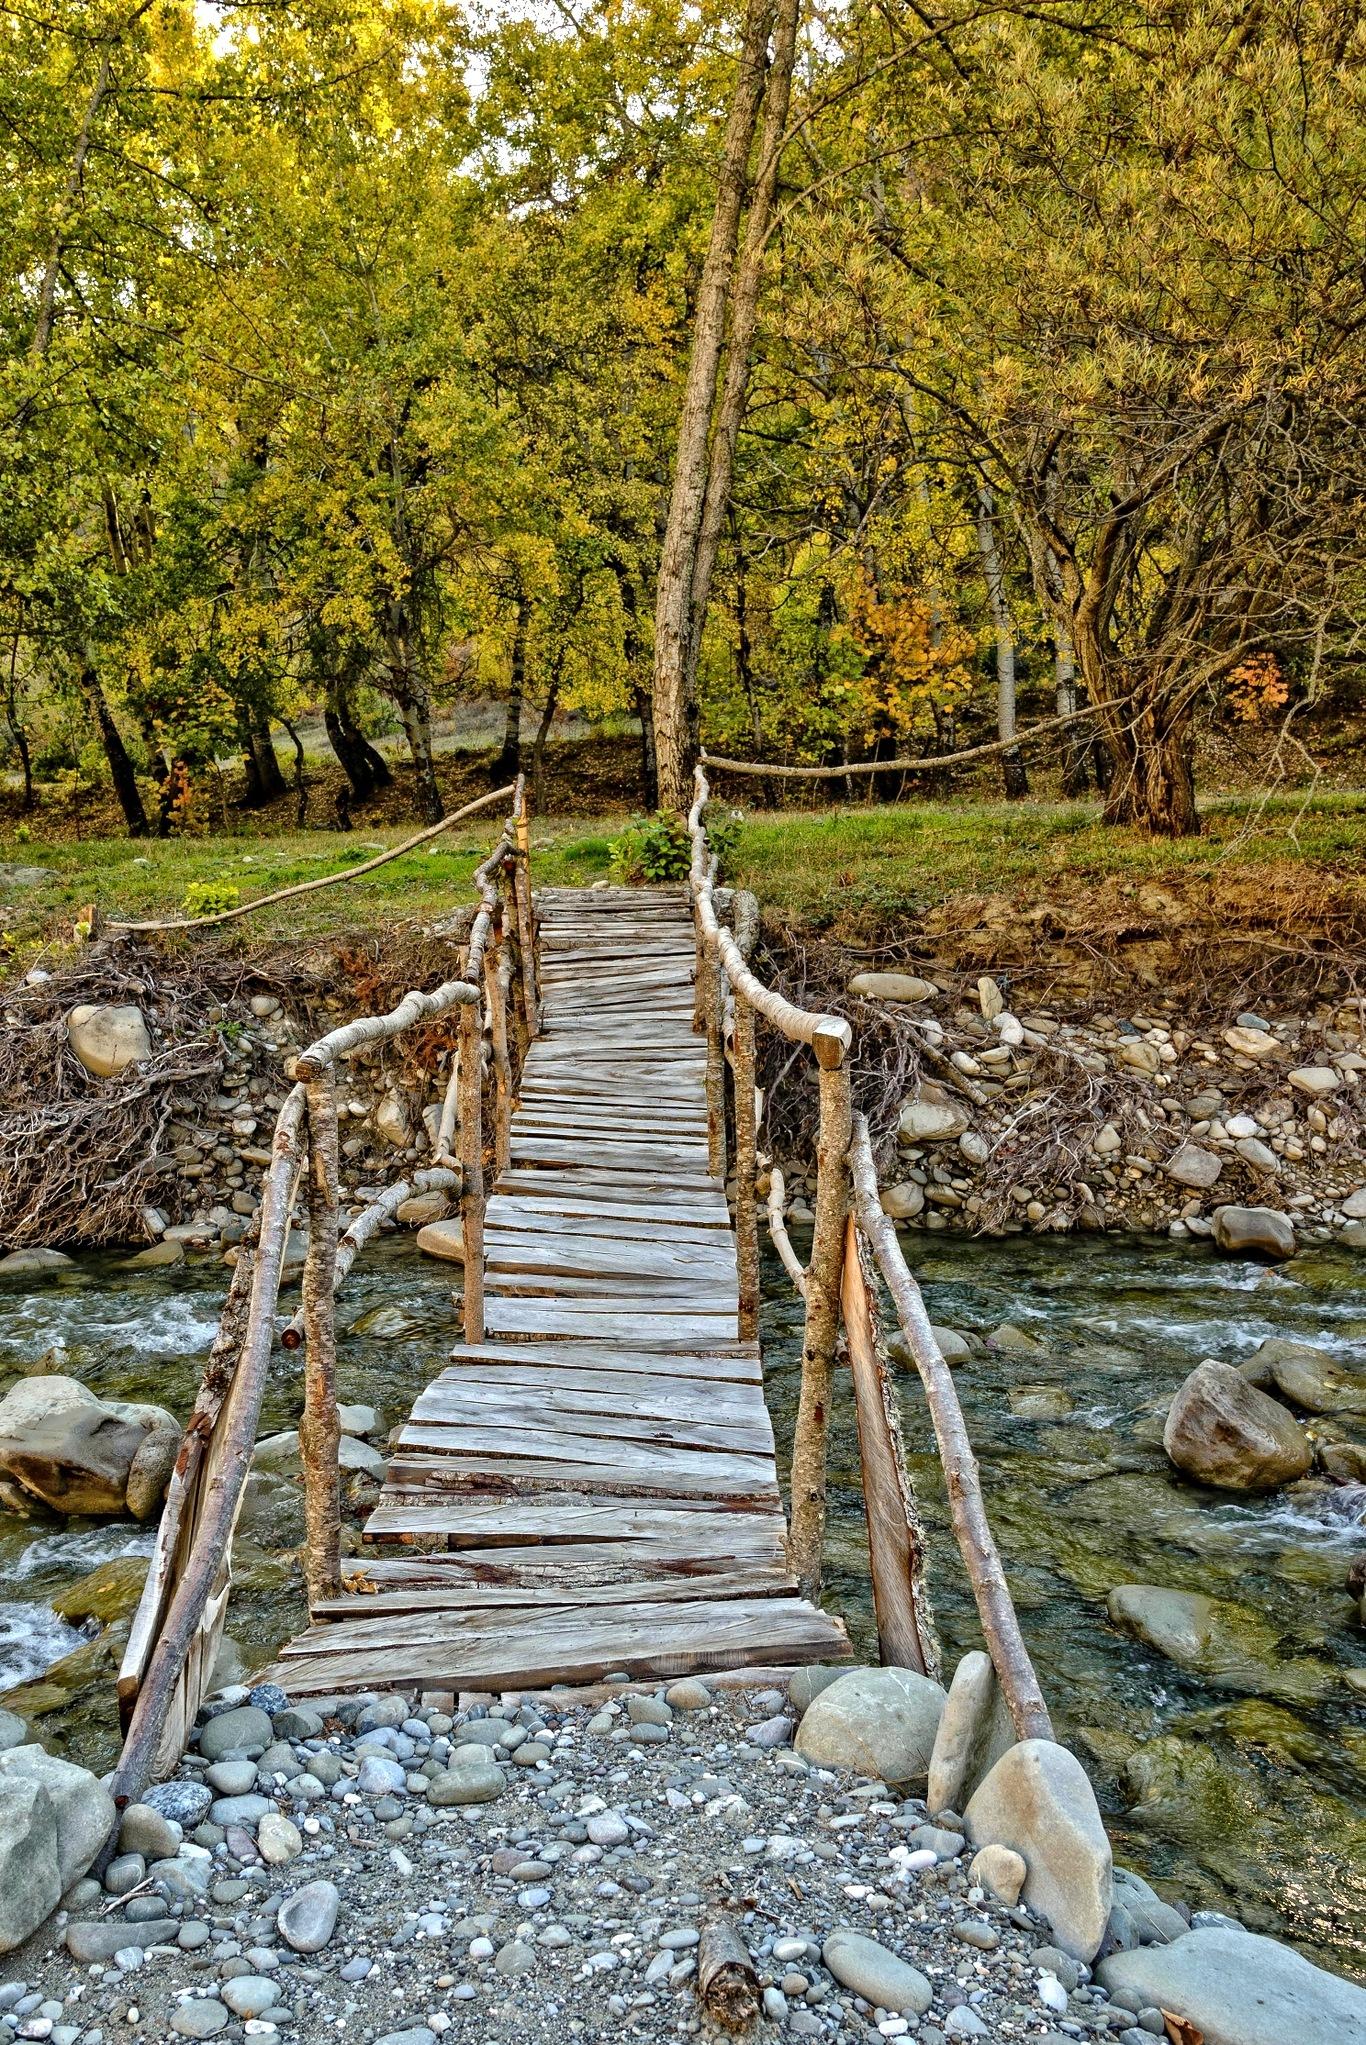 The bridge to paradise. by Stamatis Vlahos